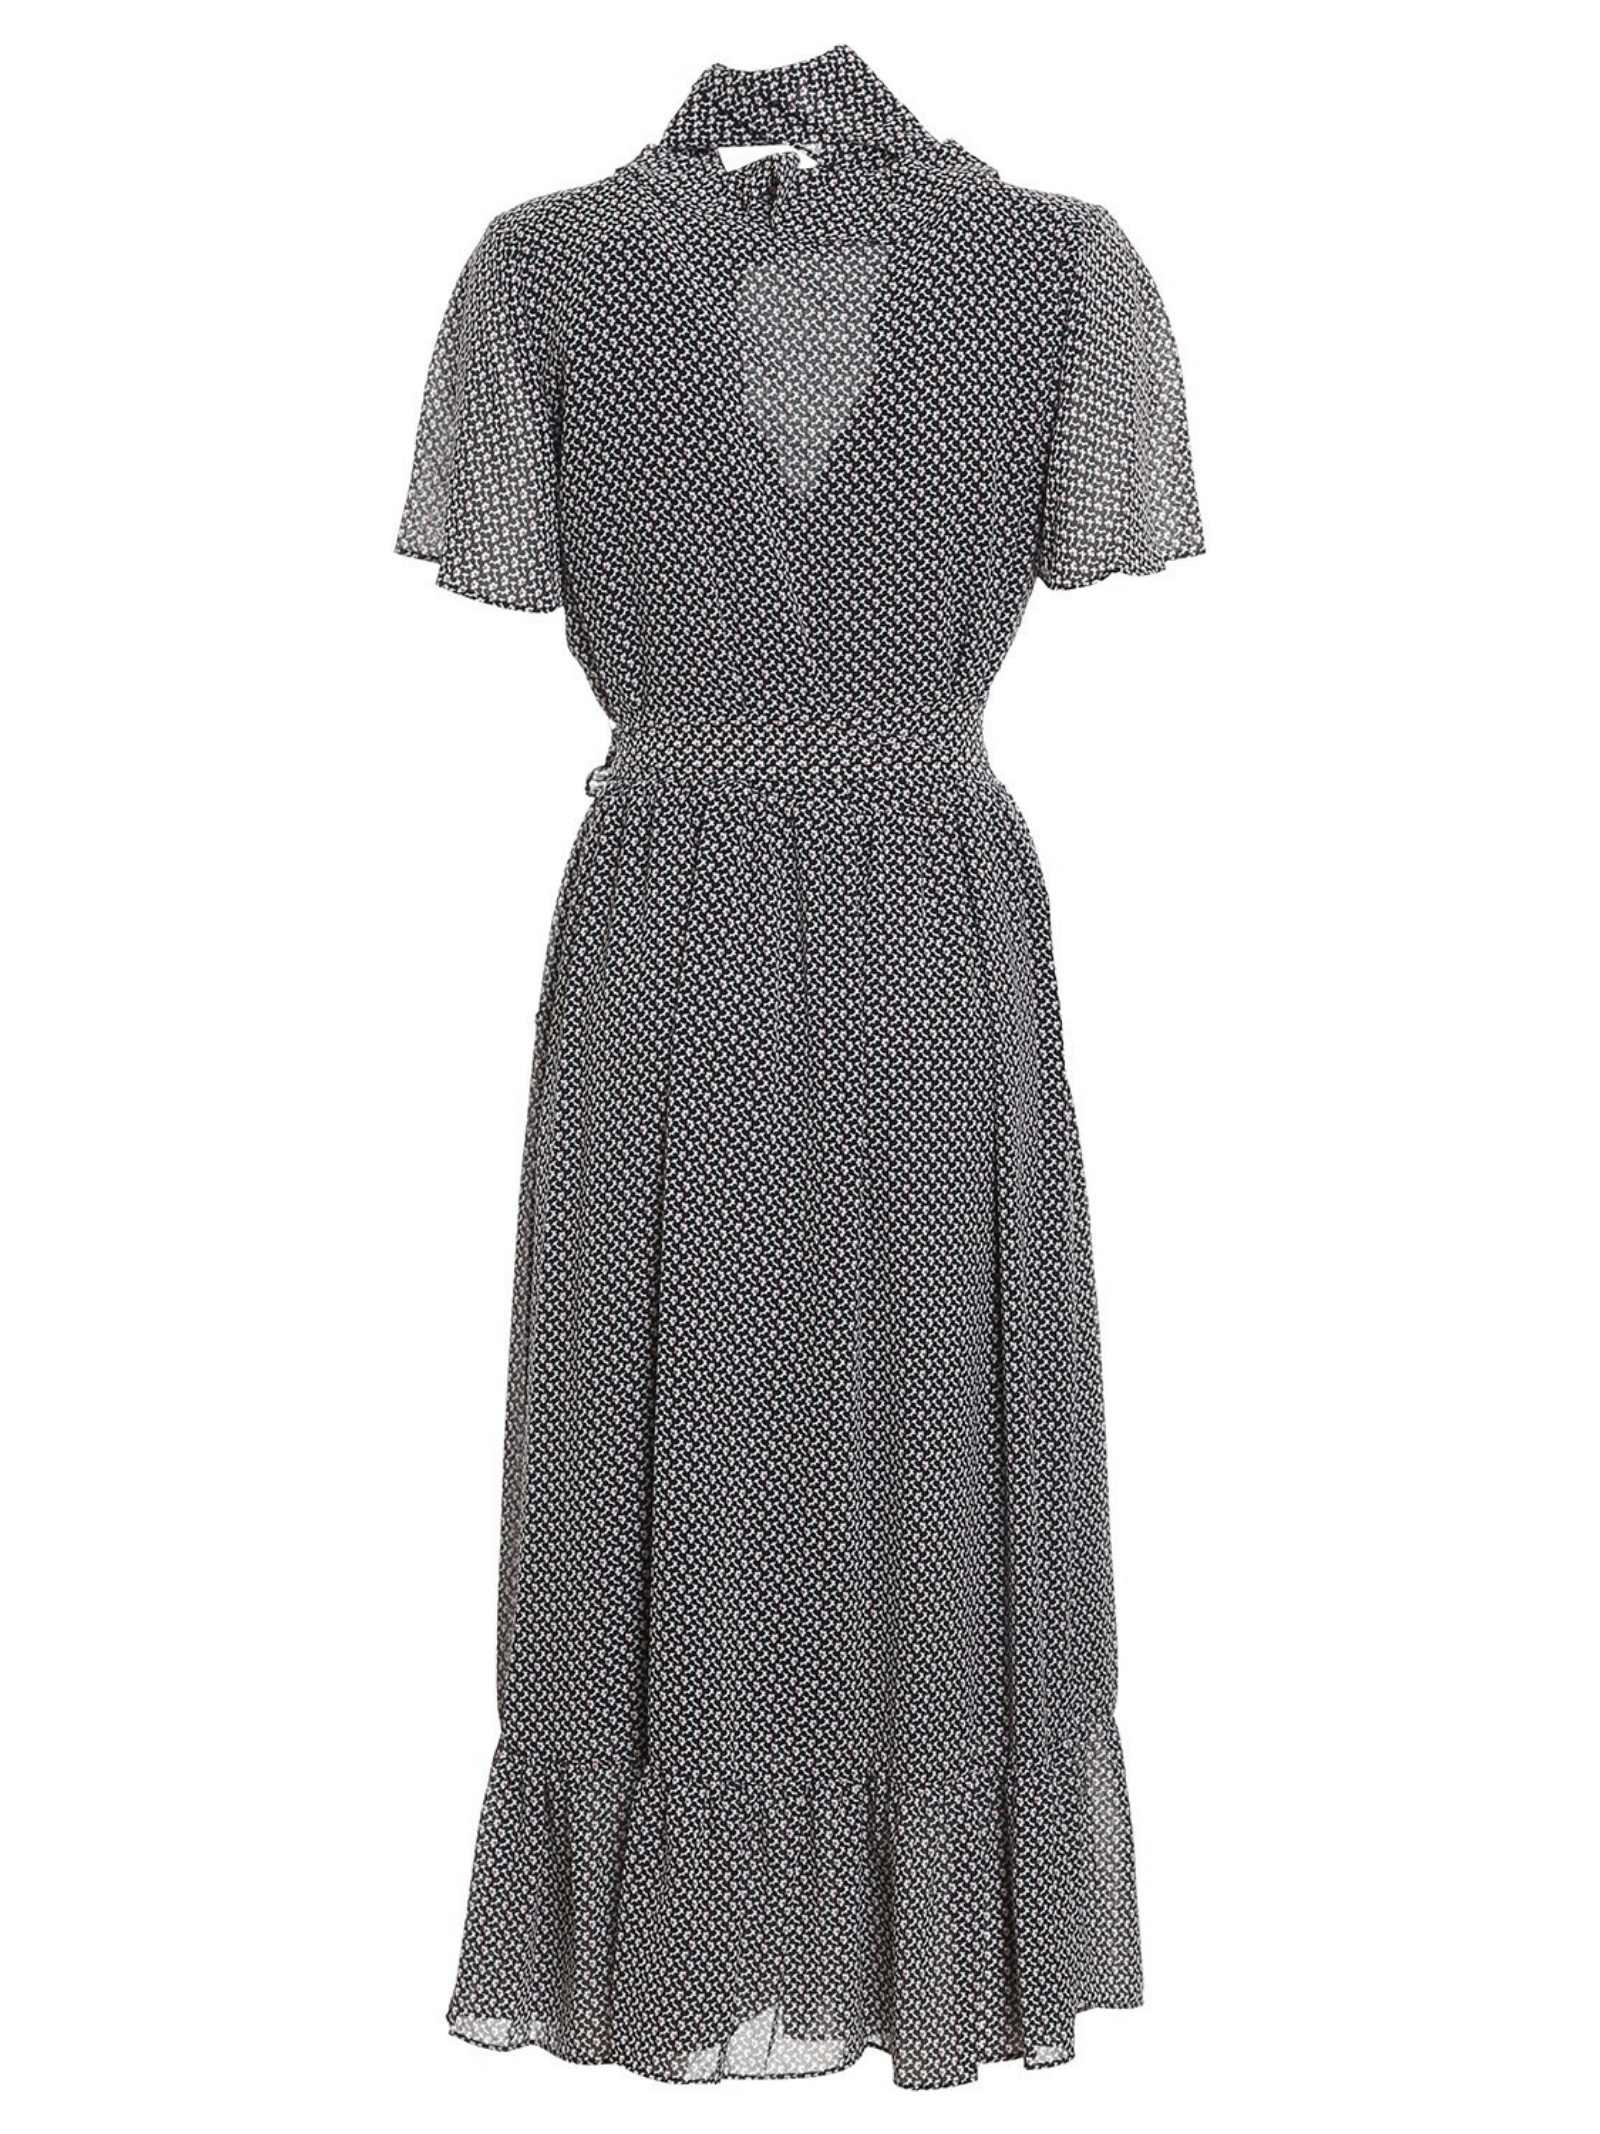 MICHAEL KORS   Dress   MS180LC20K486